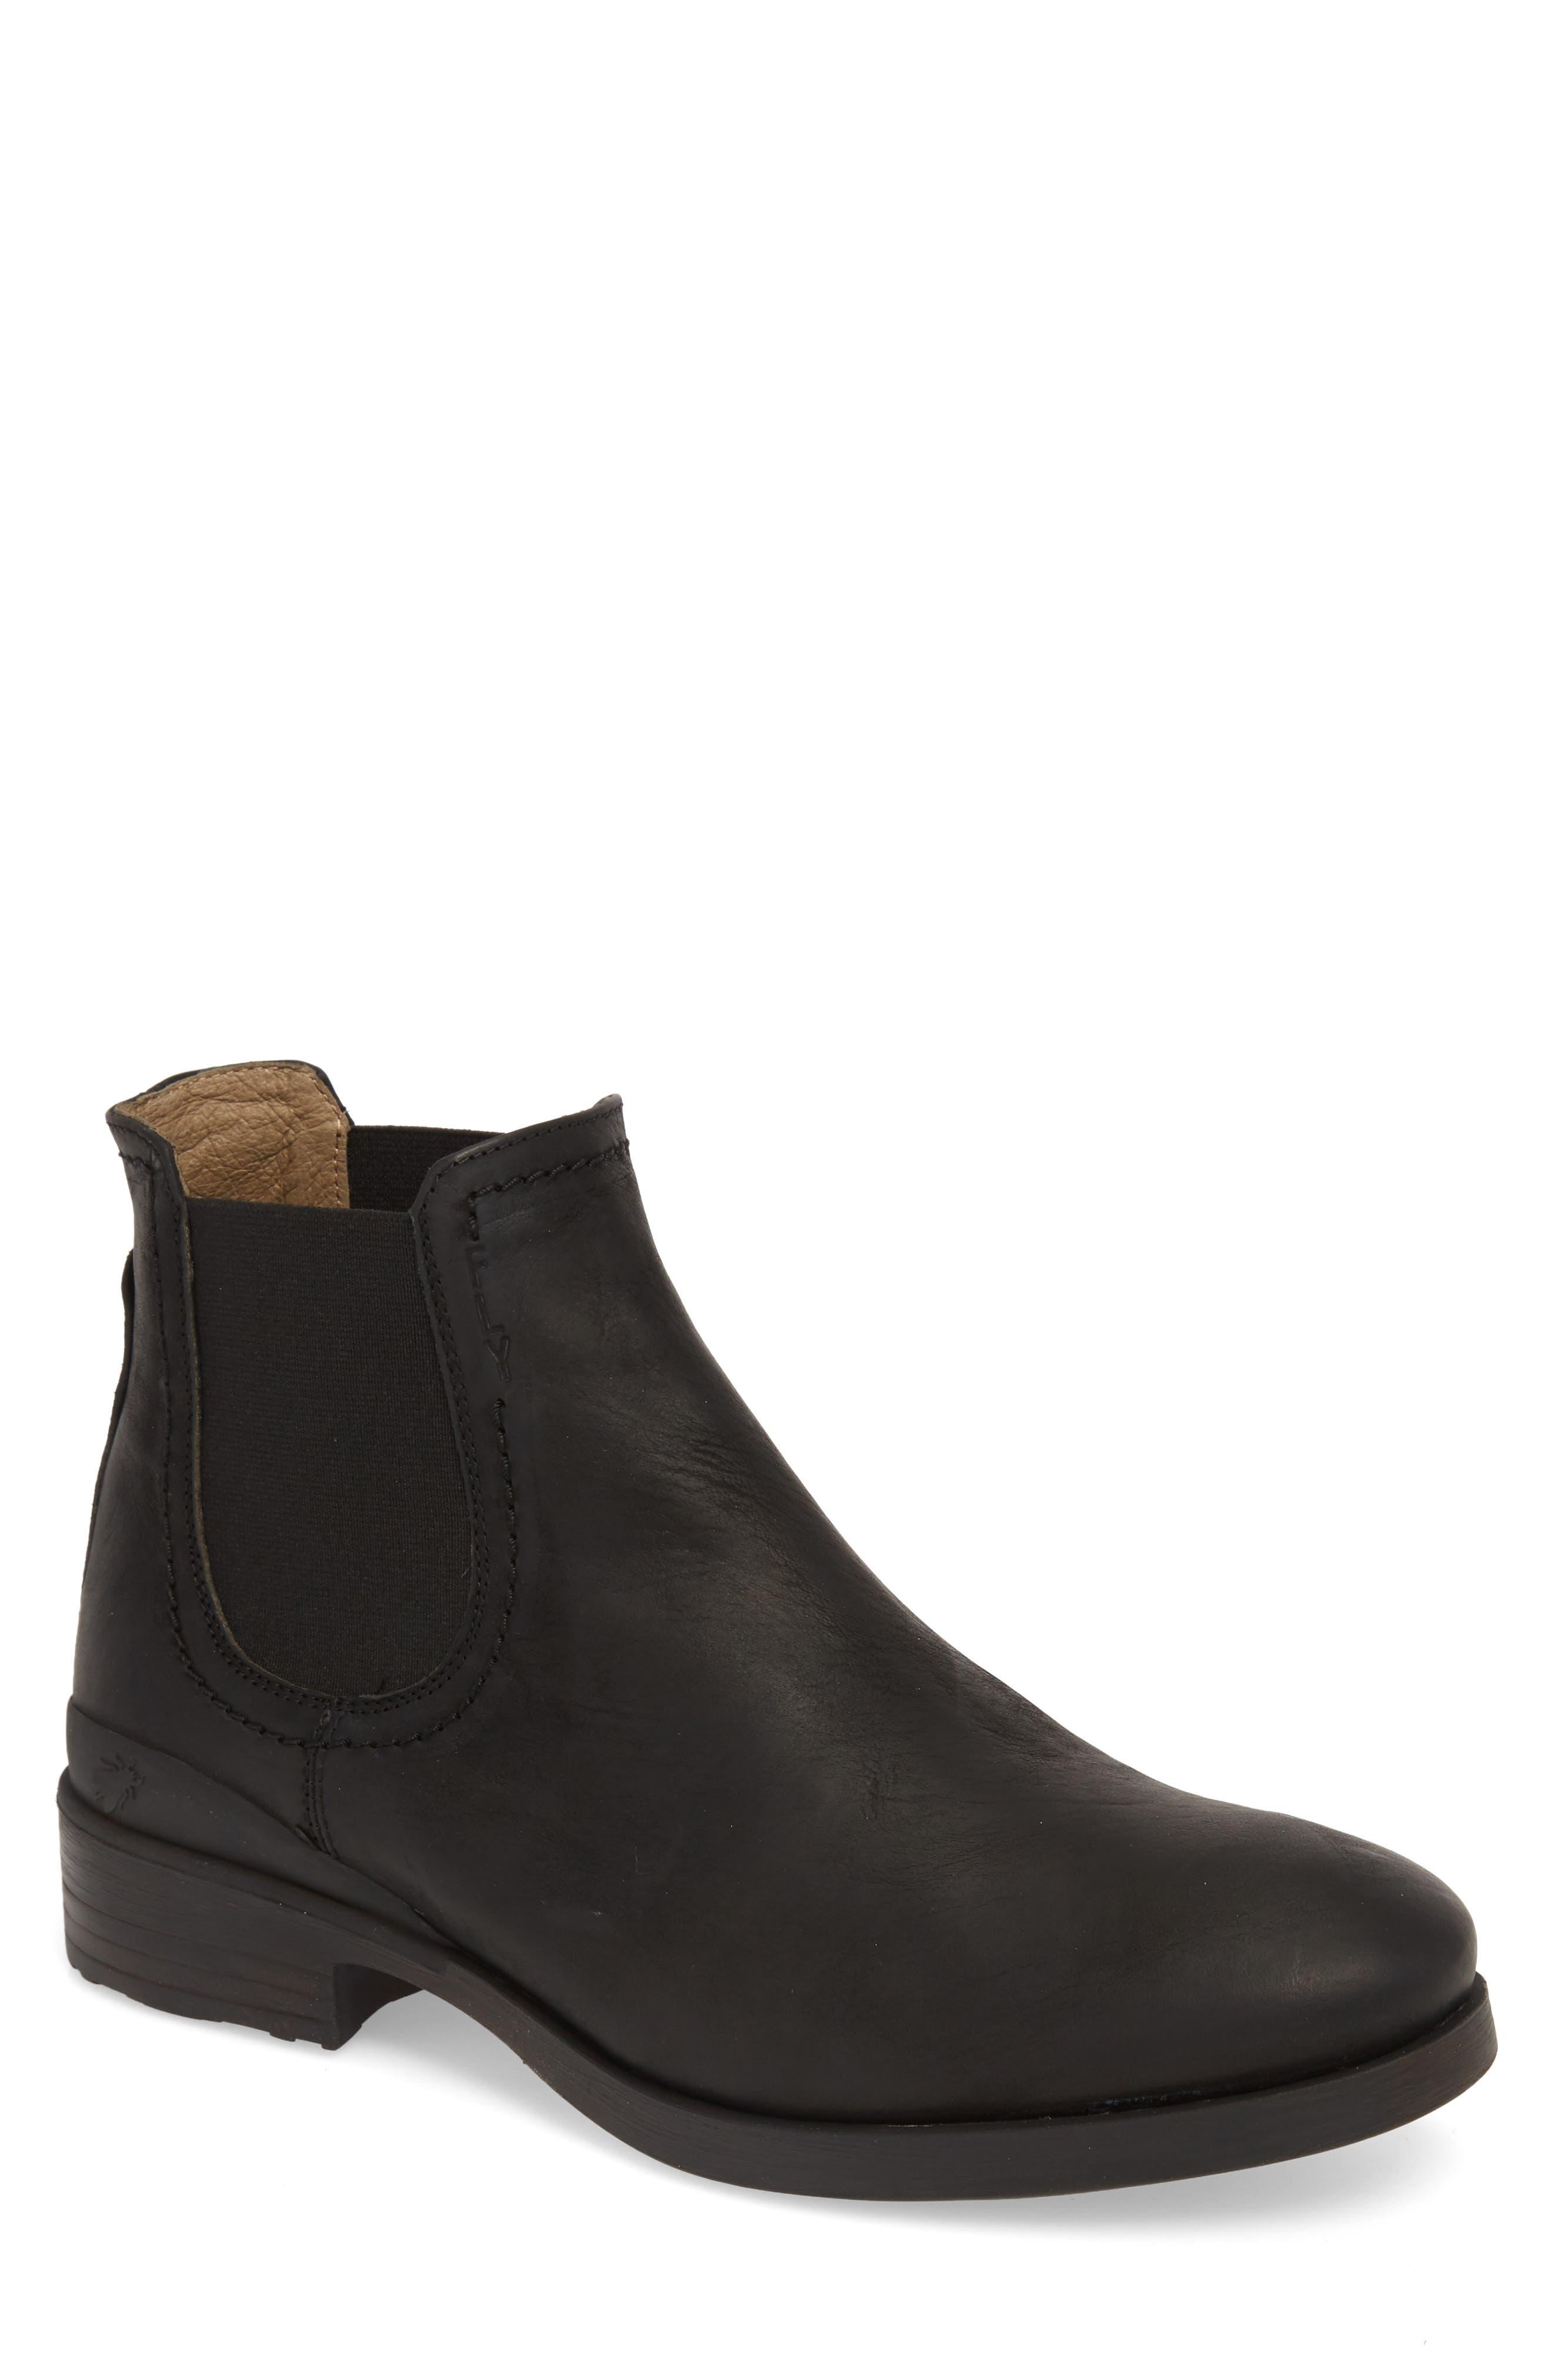 Meko Chelsea Boot,                         Main,                         color, BLACK BANDOLERO